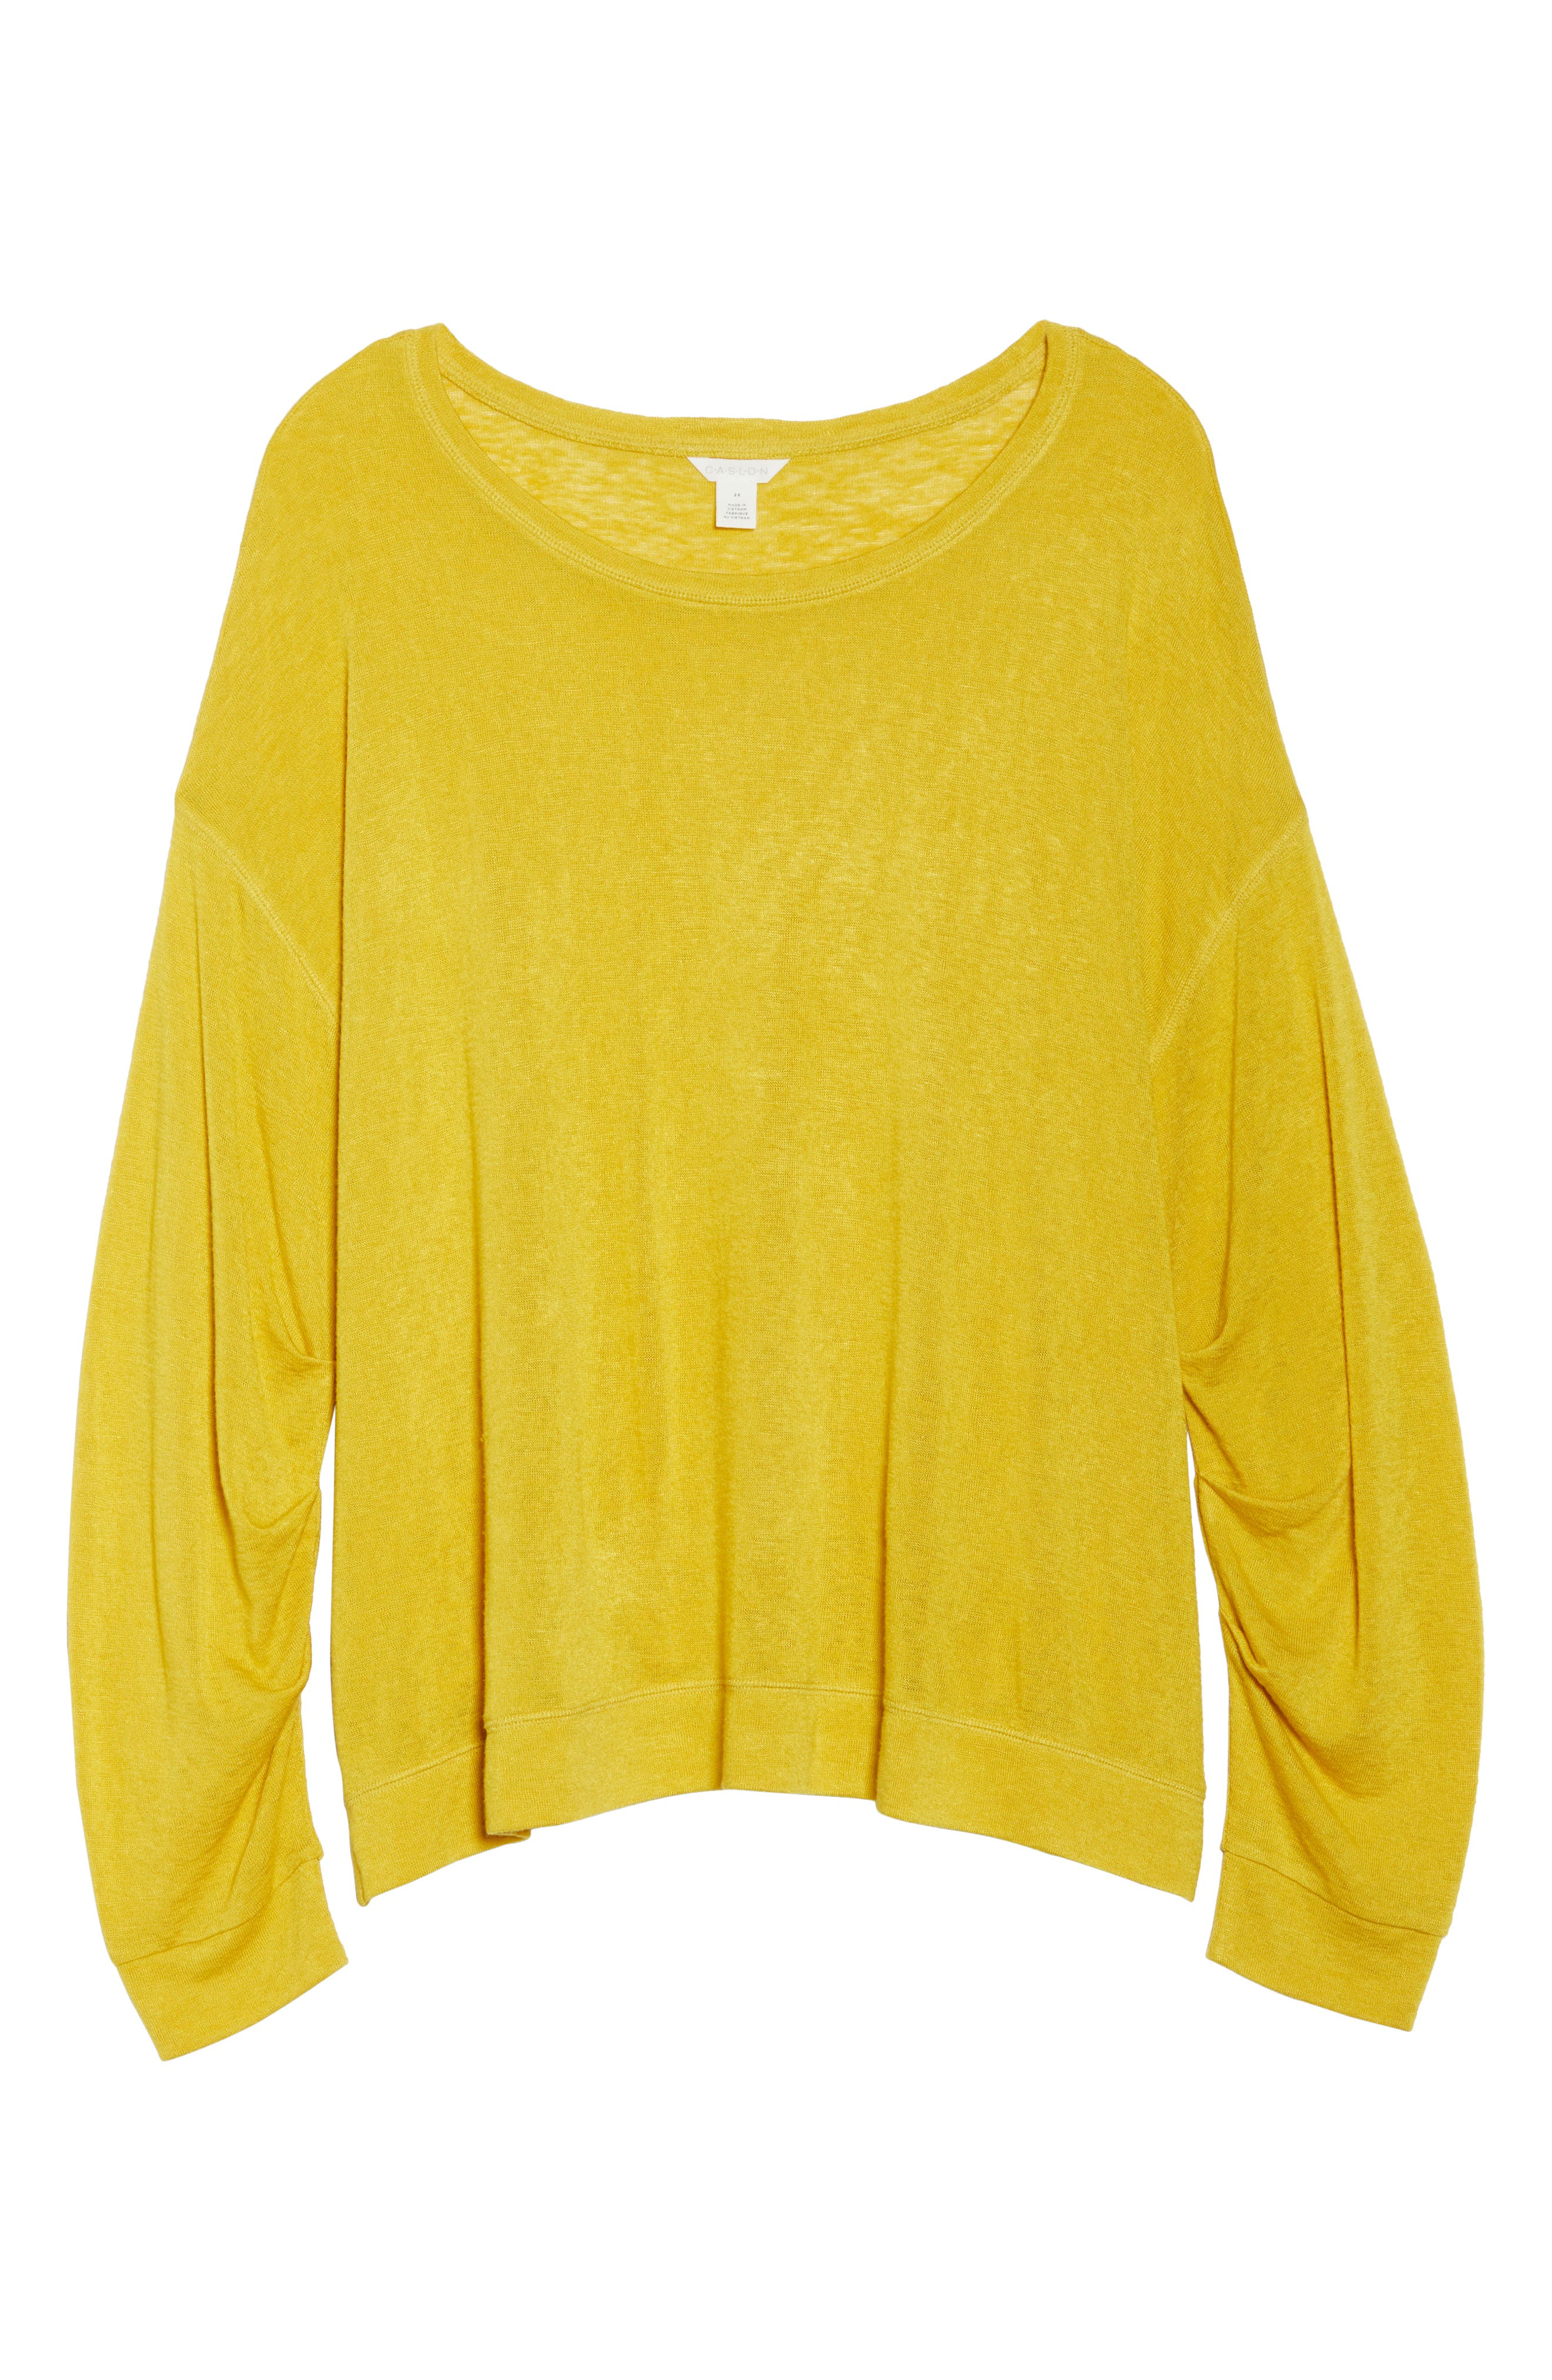 Tuck Sleeve Sweatshirt,                             Alternate thumbnail 6, color,                             Yellow Tea